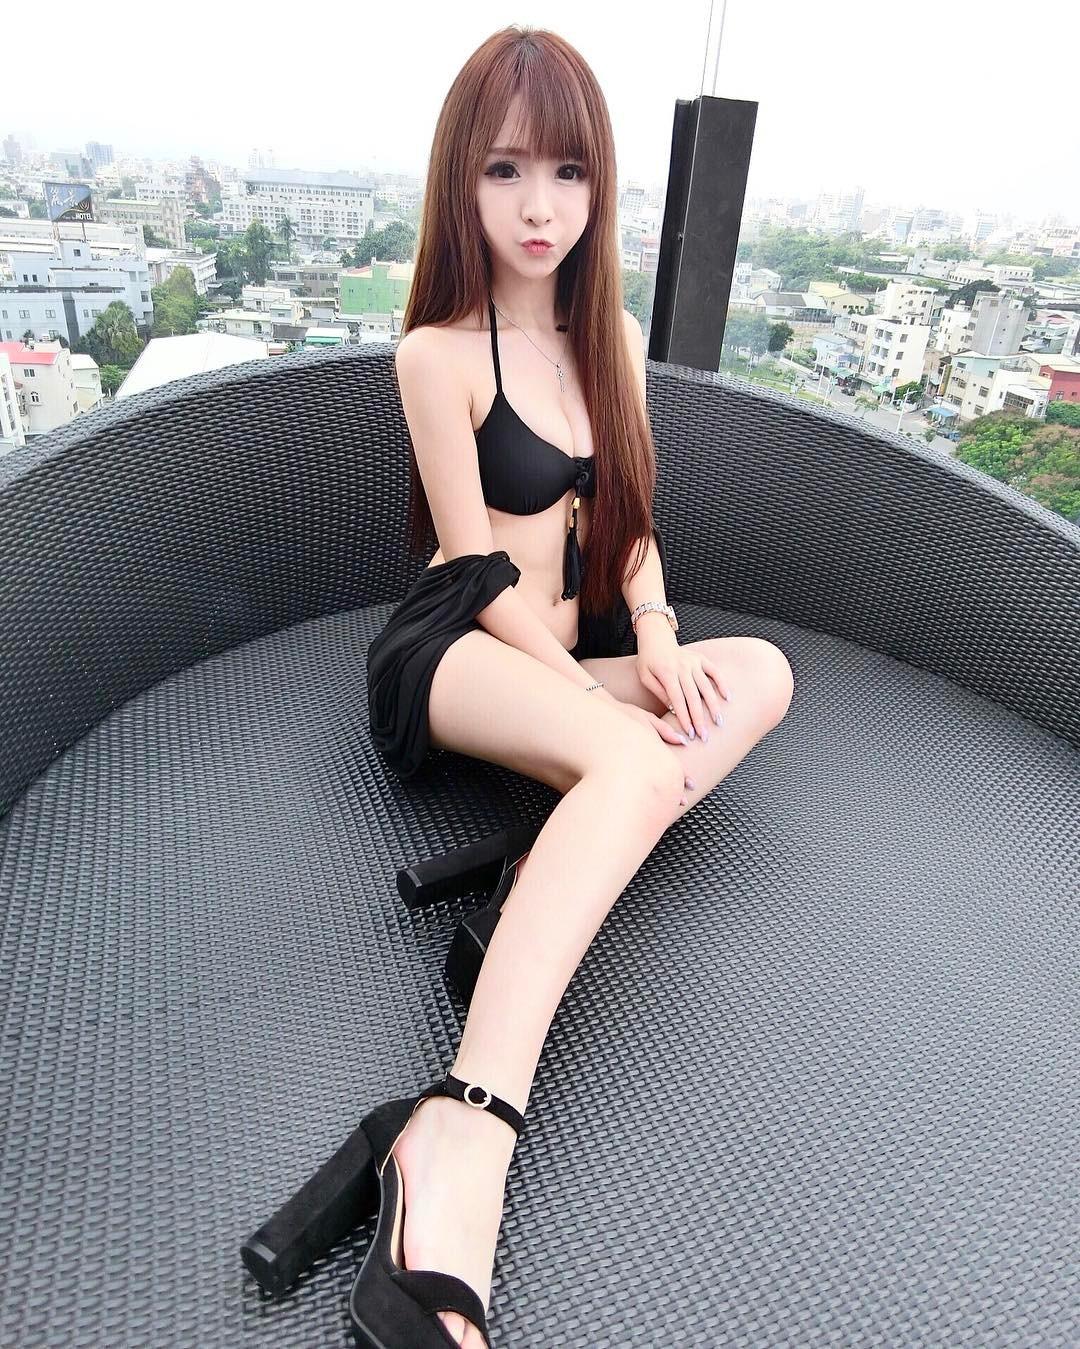 lkk_chu_20633945_495361107470530_1437395596850757632_n